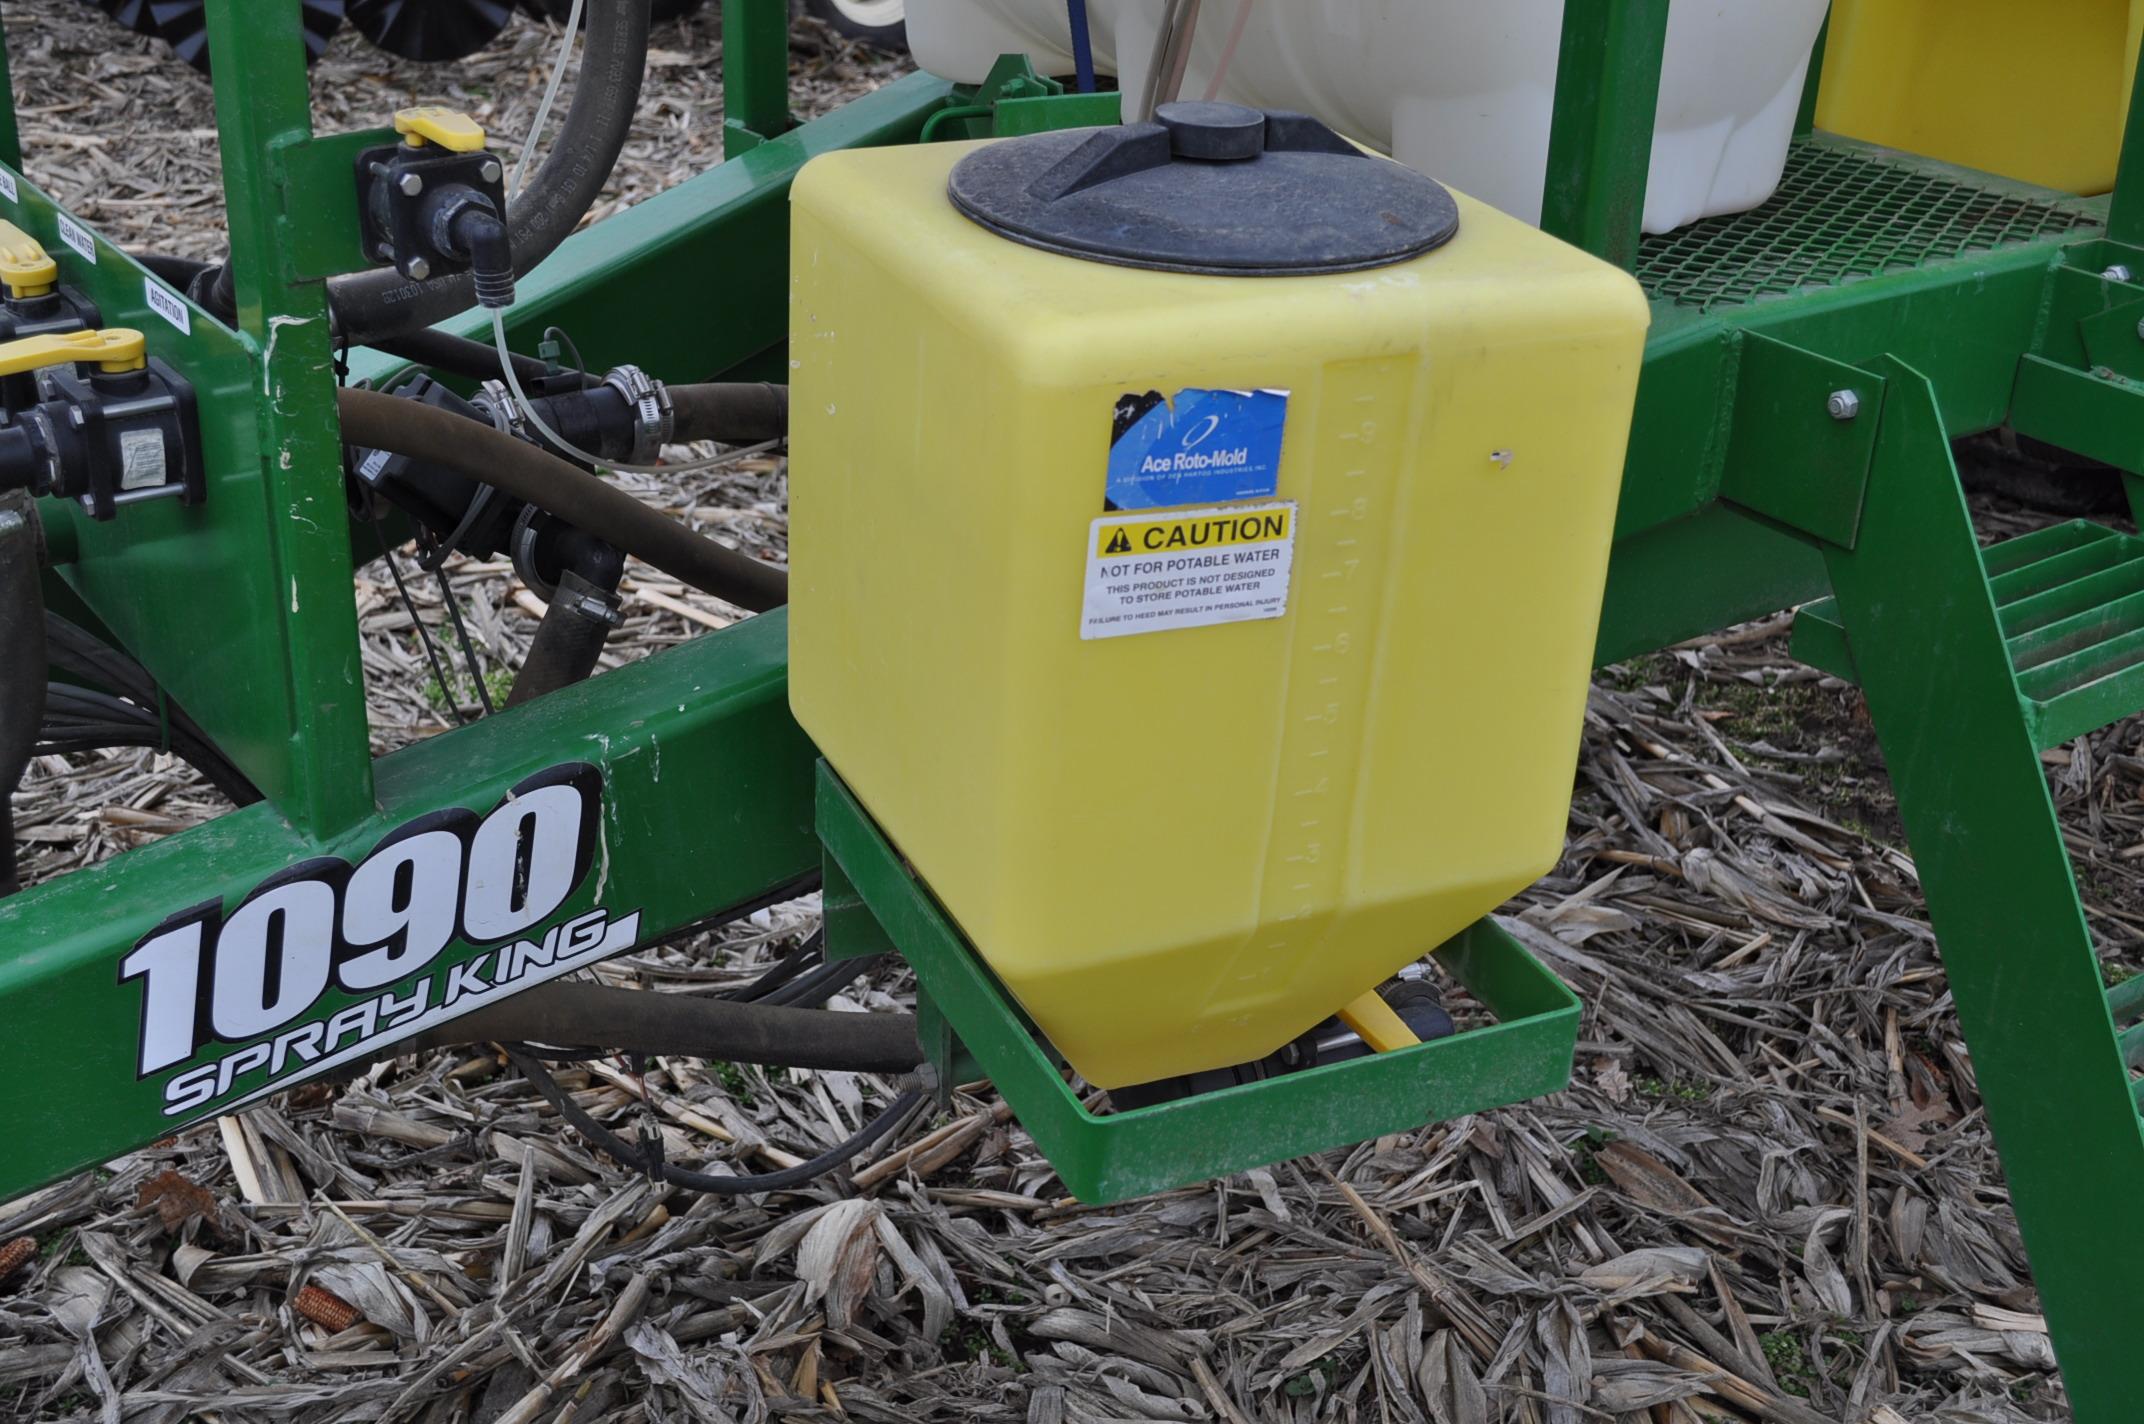 60' Spray King 1090 sprayer, 1000 gal poly tank, 100 gal rinse tank, foam marker, inductor, hyd - Image 8 of 21